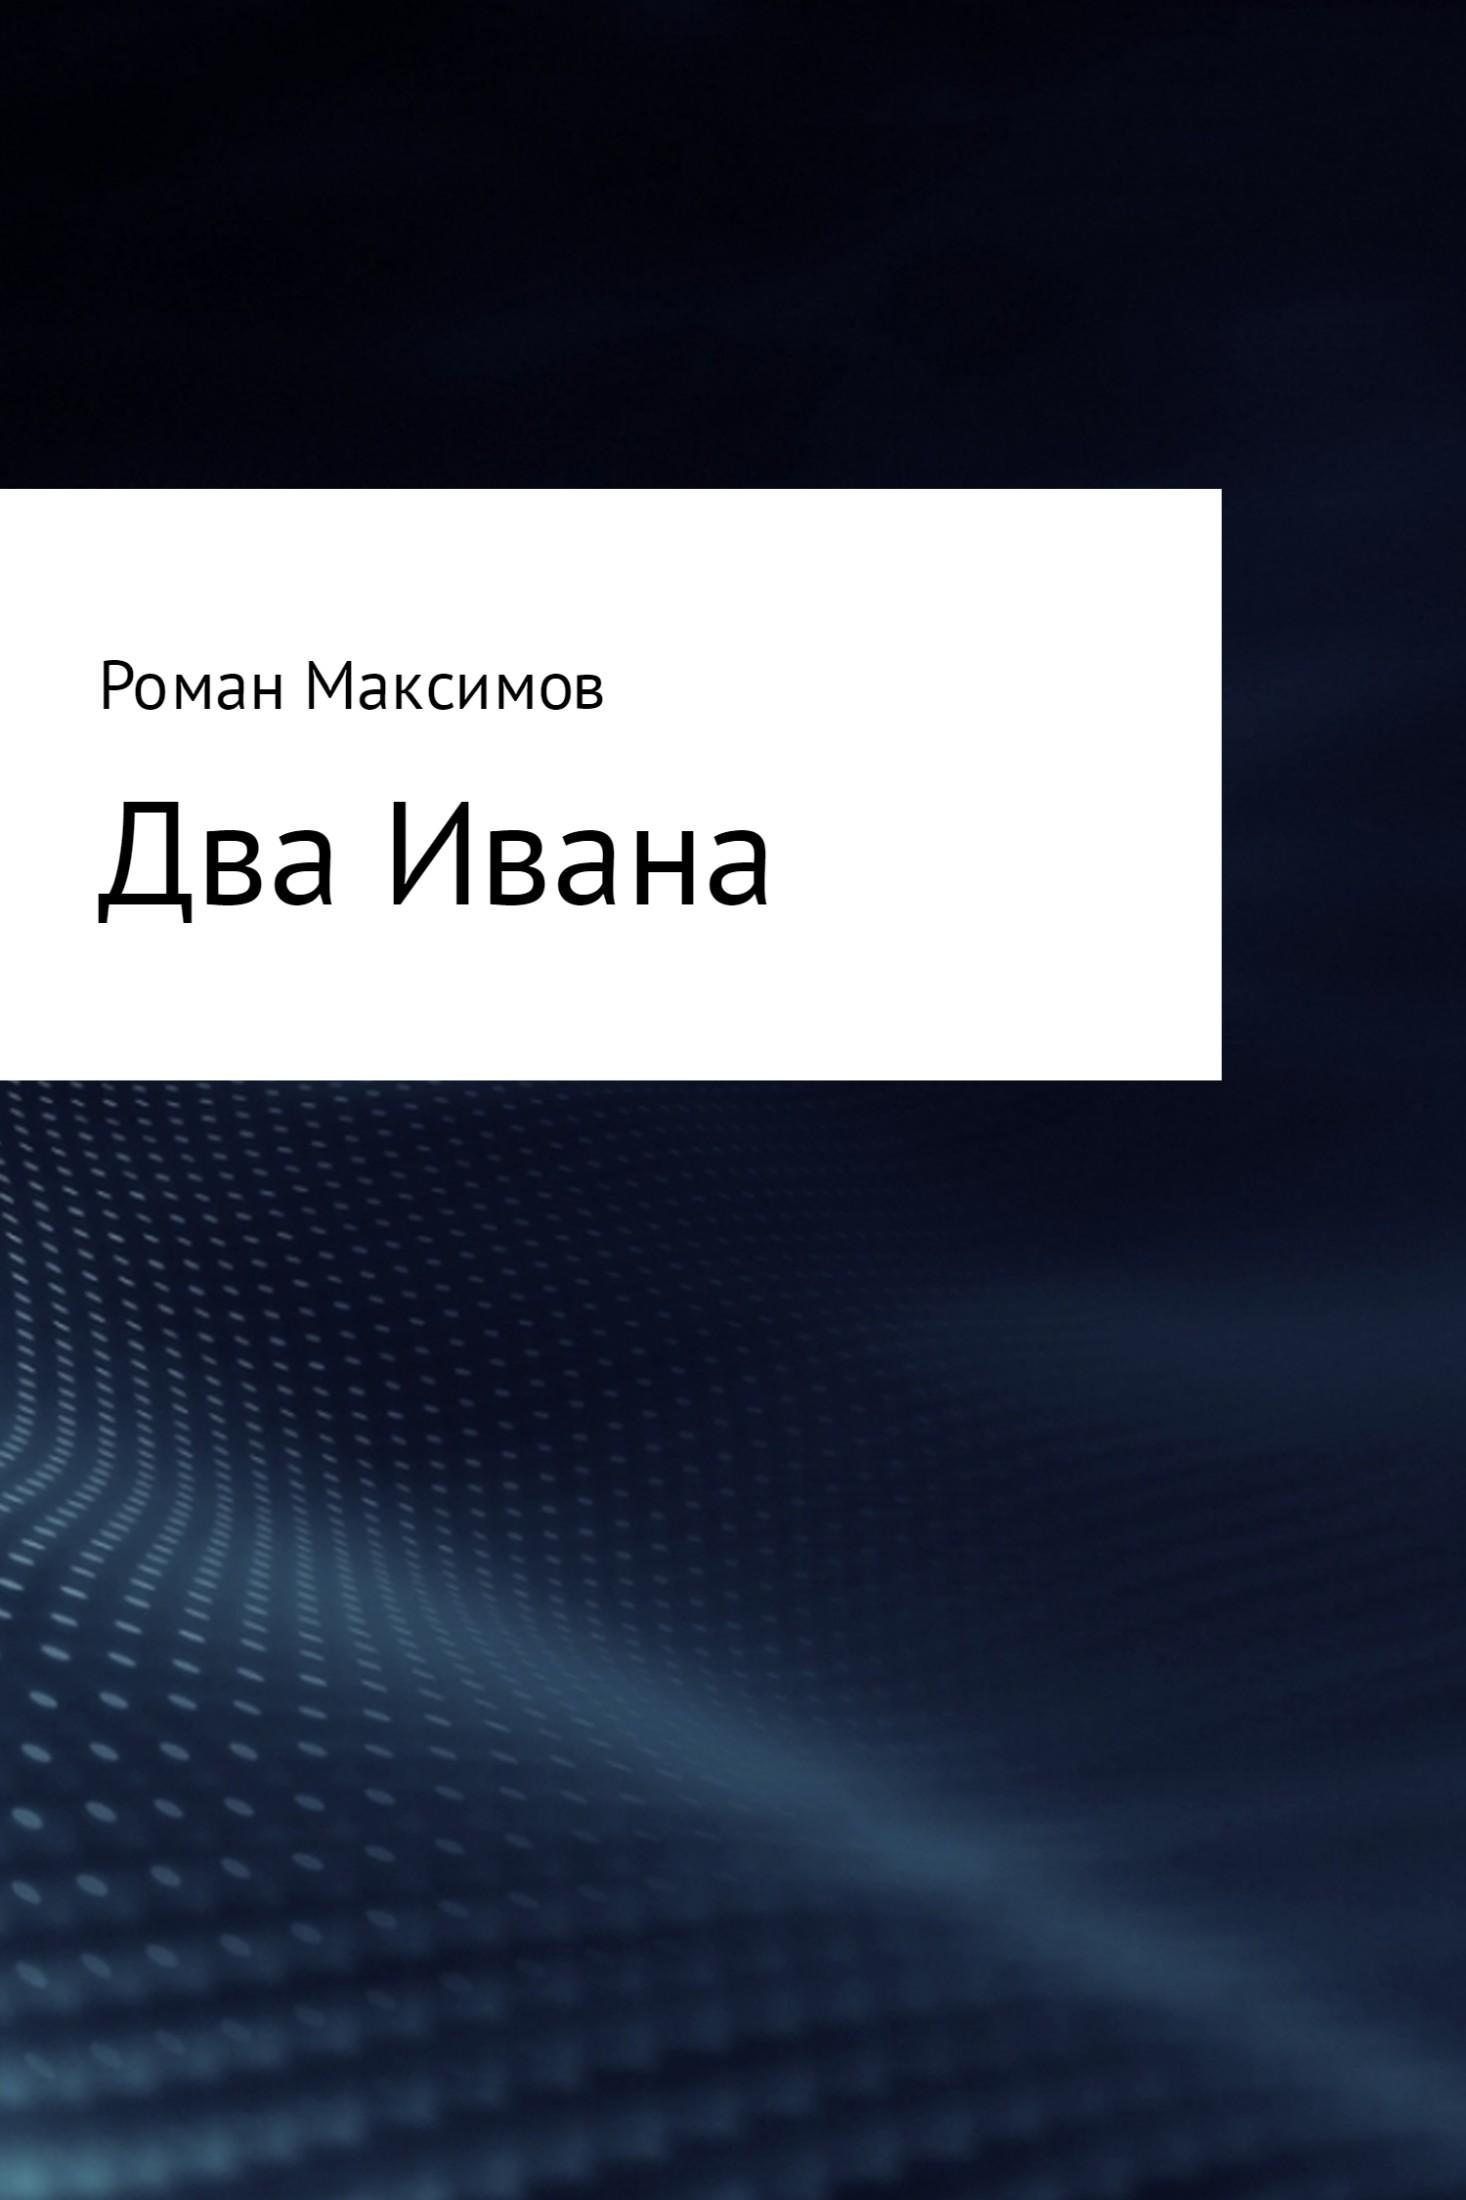 Обложка книги Два Ивана, автор Роман Романович Максимов